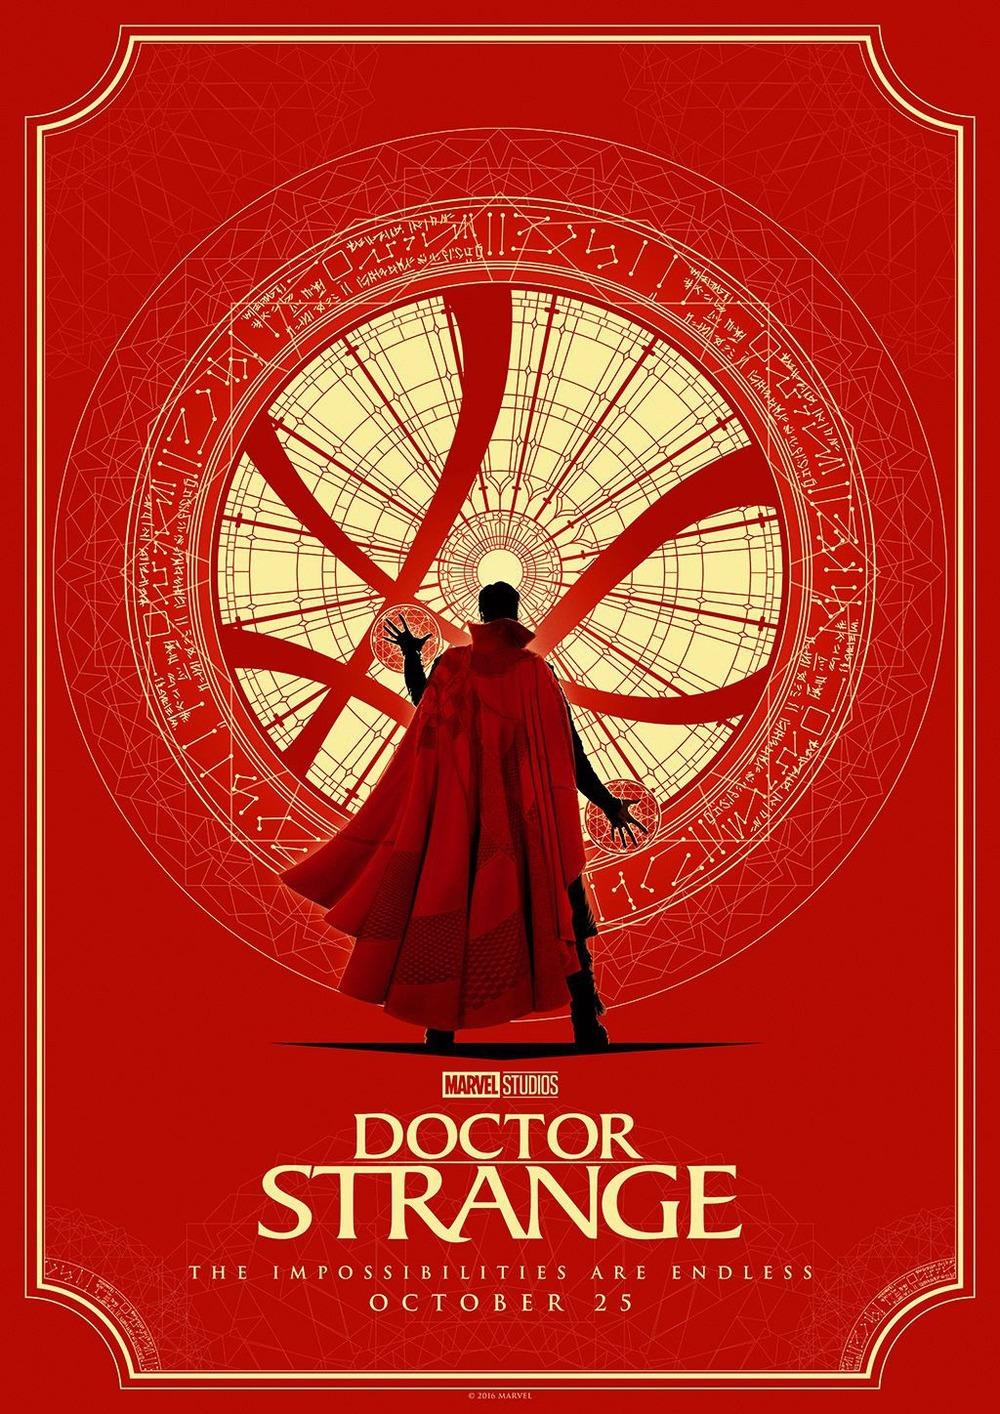 Doctor strange release date